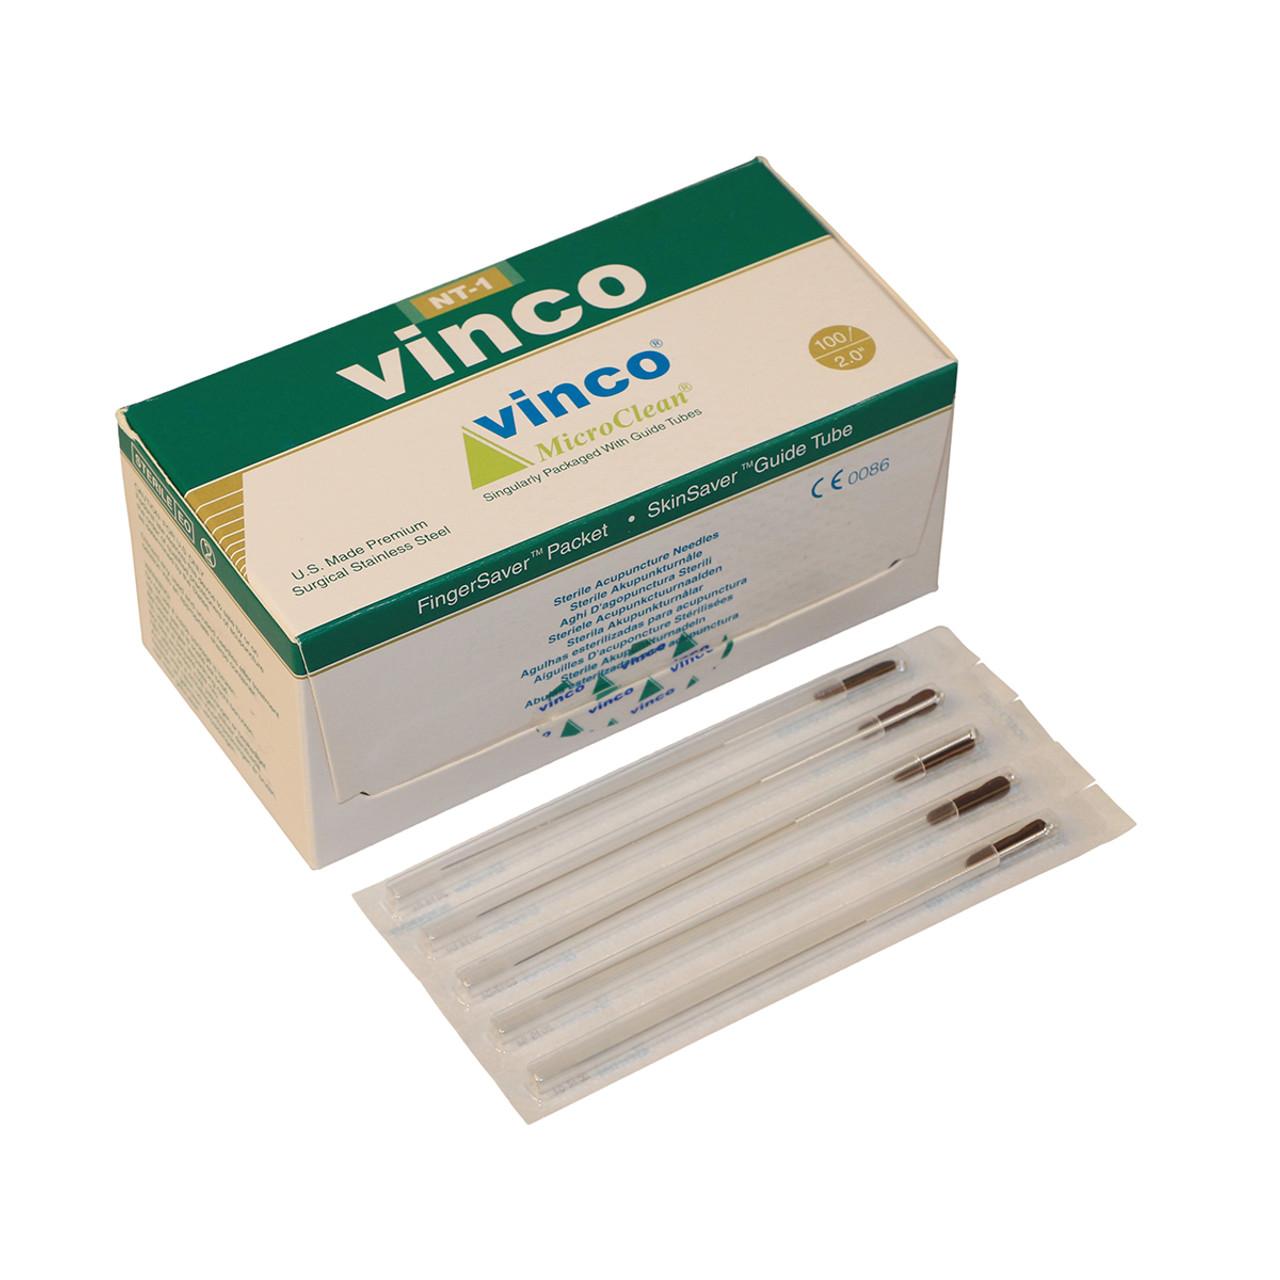 Vinco-Blister Acu Needle, 100/box, #32 x 2.0 inch